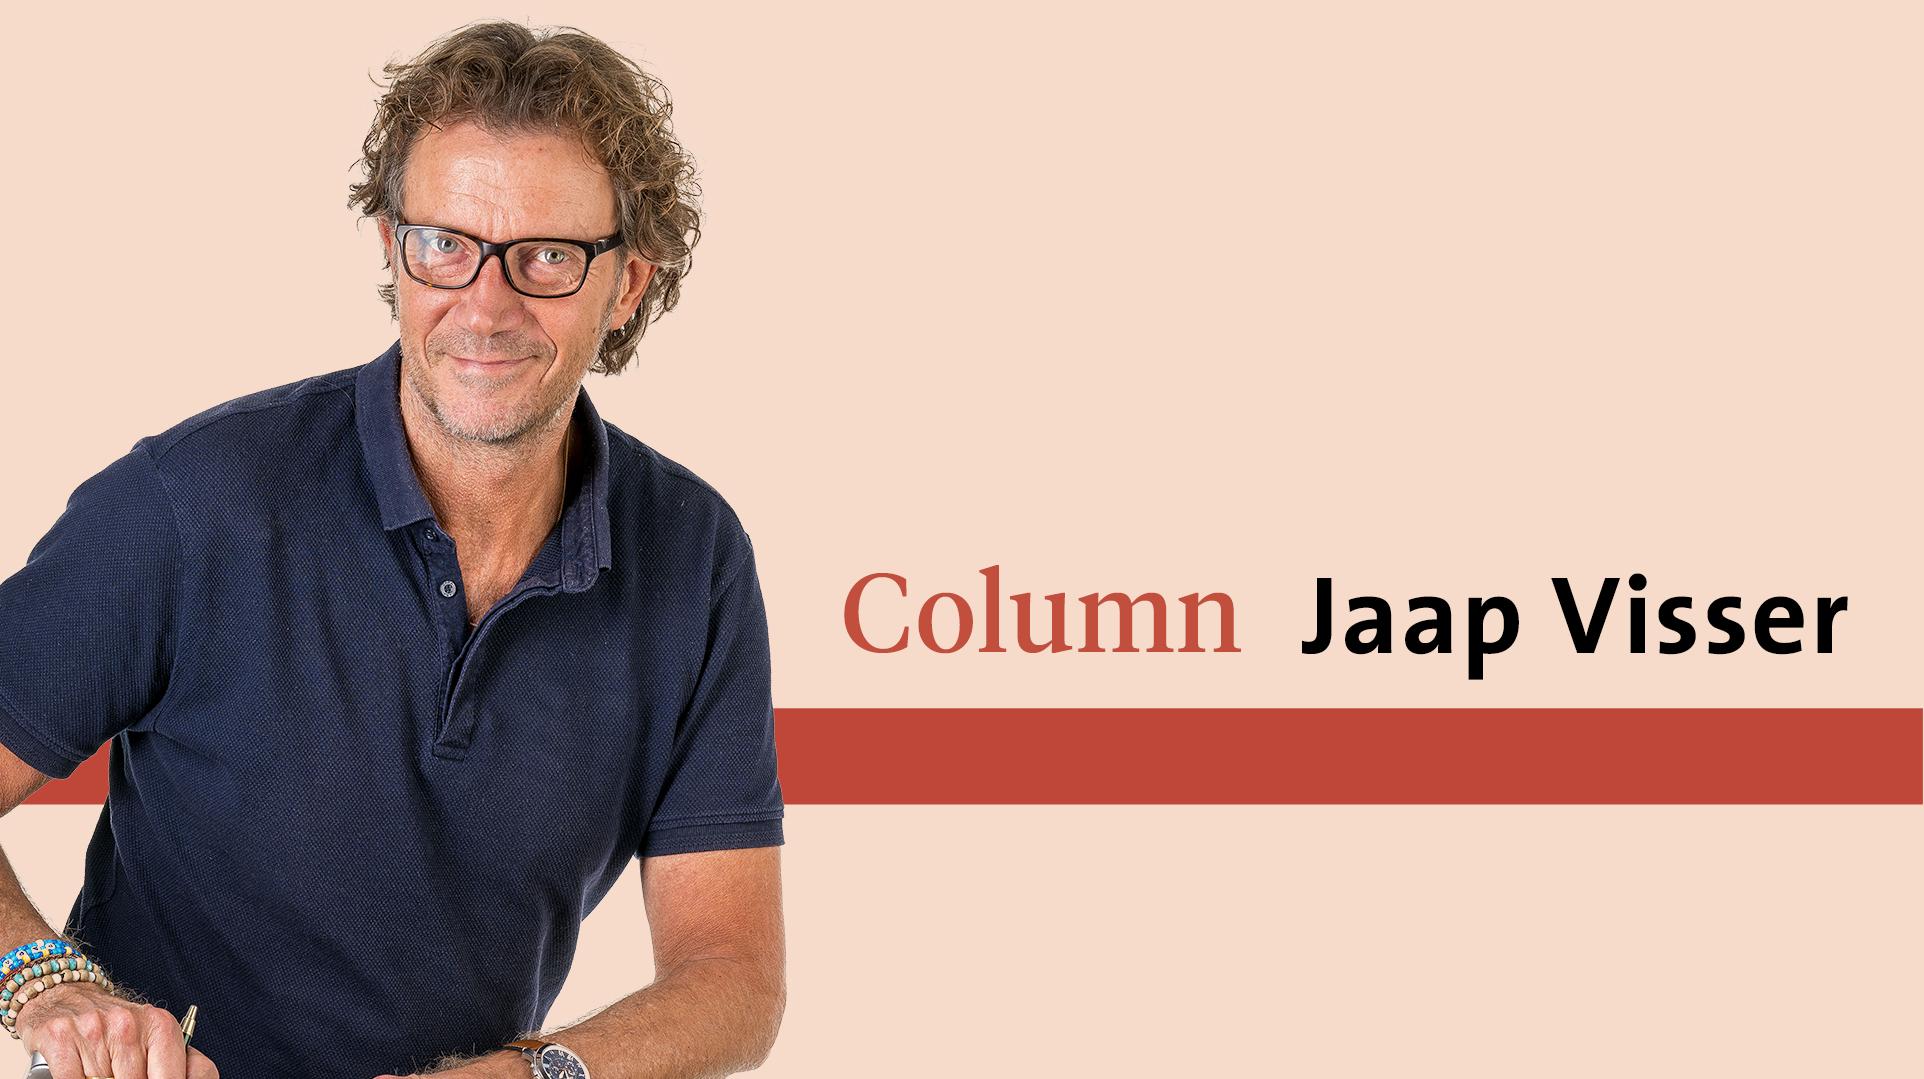 Laat de jeugd de mouwen opstropen | Column Jaap Visser